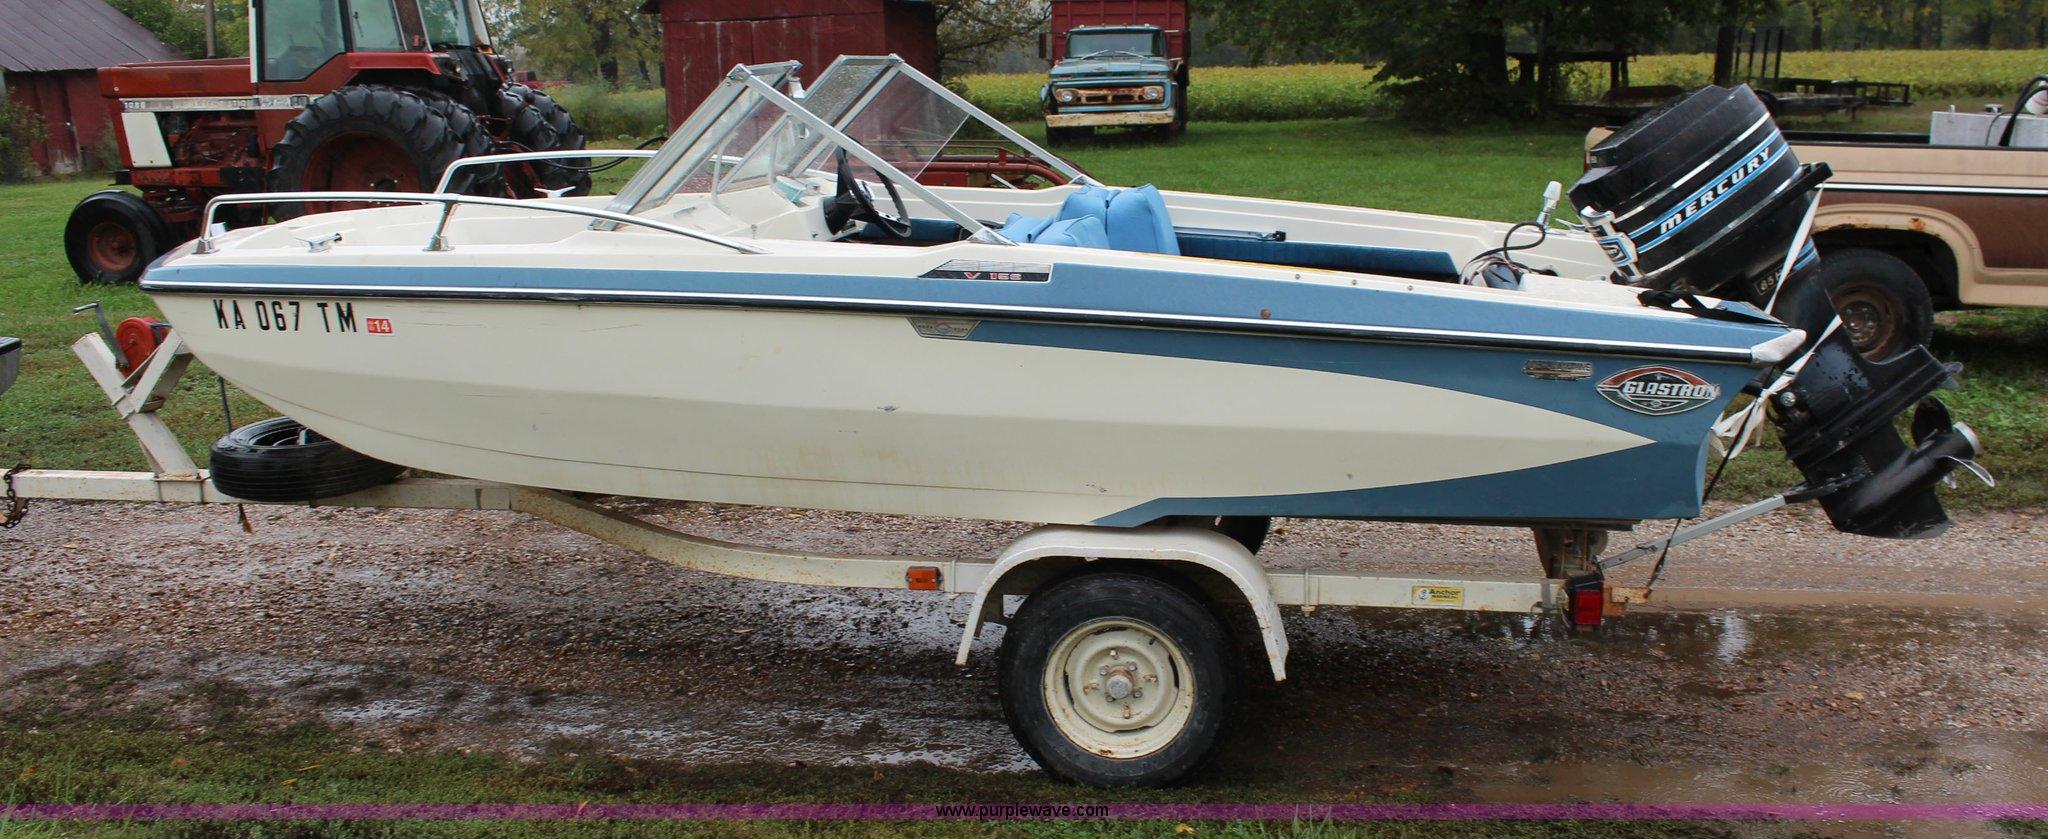 1970 Glastron V156 Aqualift boat | Item I5880 | SOLD! Octobe